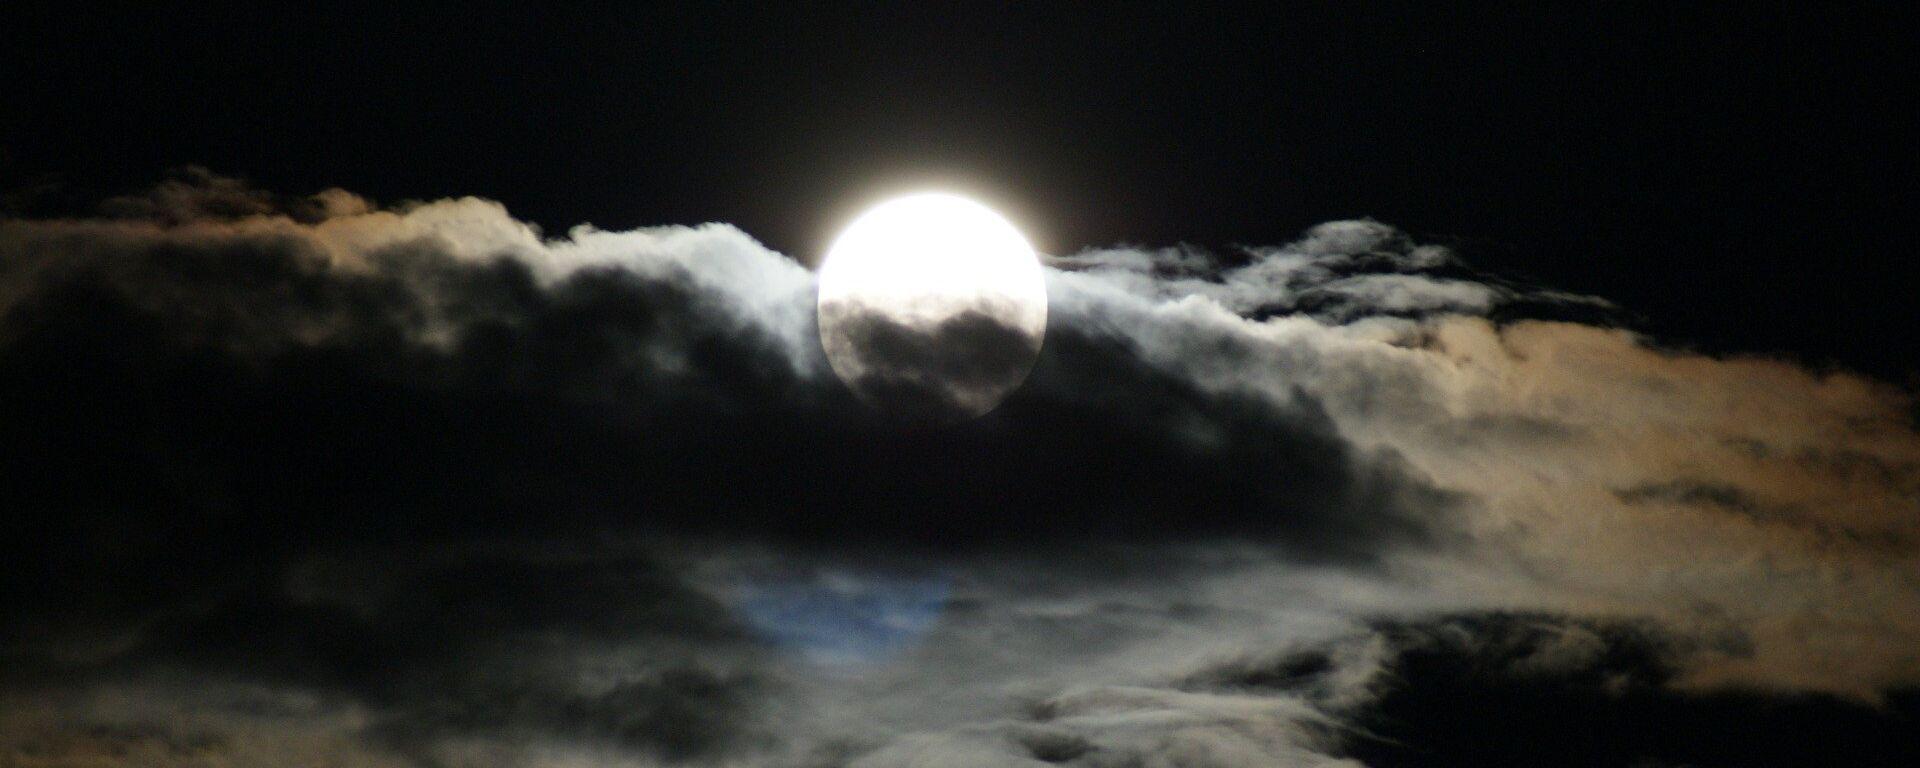 La luna entre las nubes - Sputnik Mundo, 1920, 26.04.2021